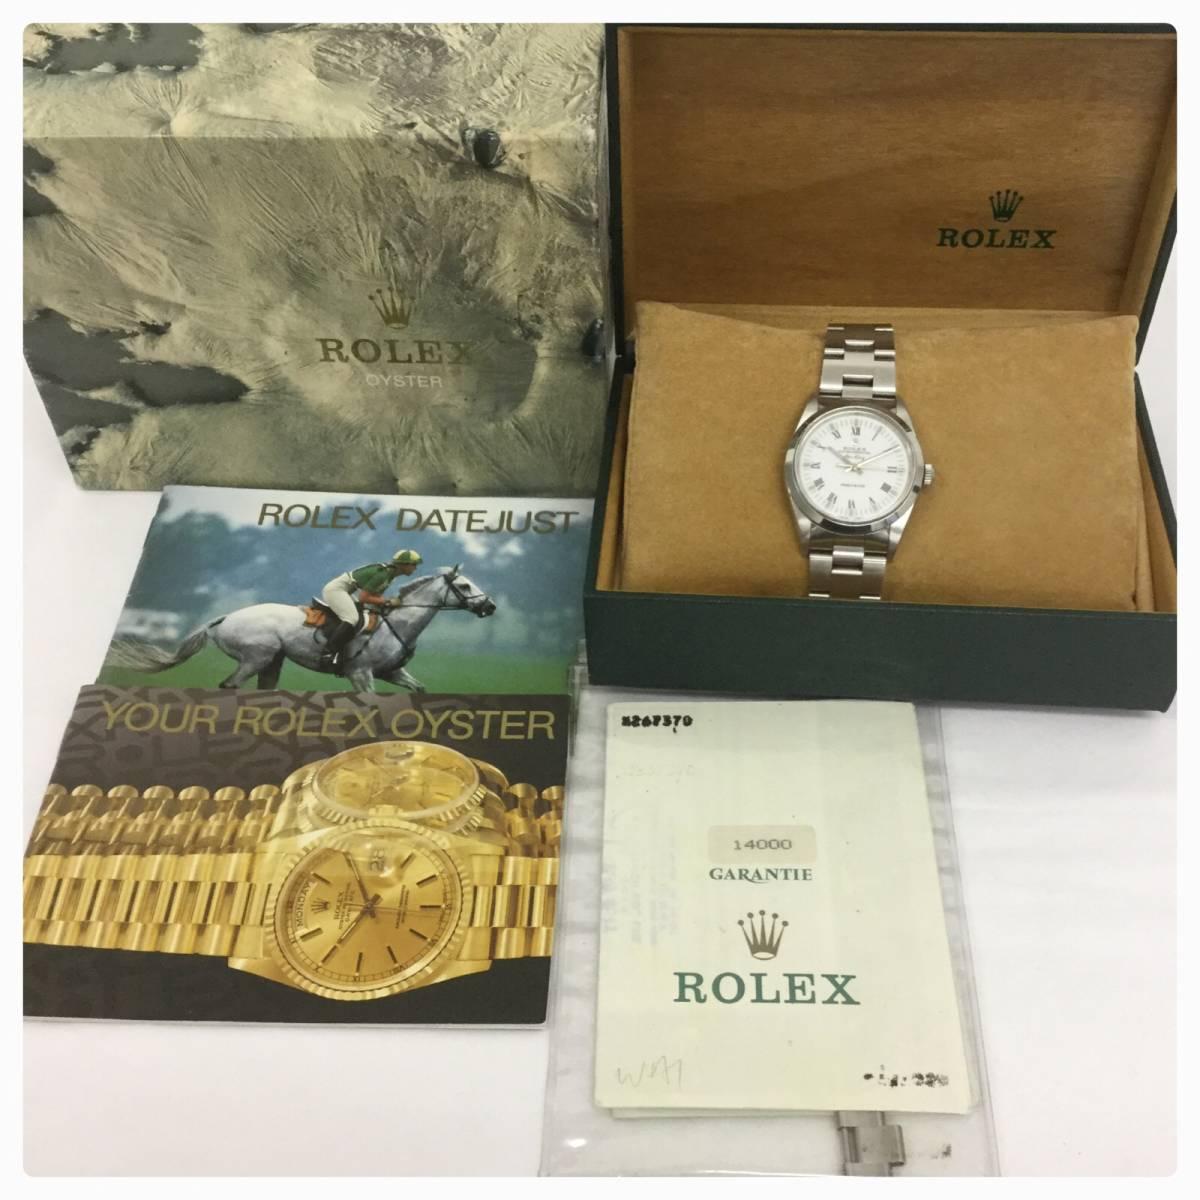 ● ROLEX ロレックス OYSTER PERPETUAL Air-King オイスターパーペチュアル エアキング Ref. 14000 自動巻 腕時計 箱付 動作品